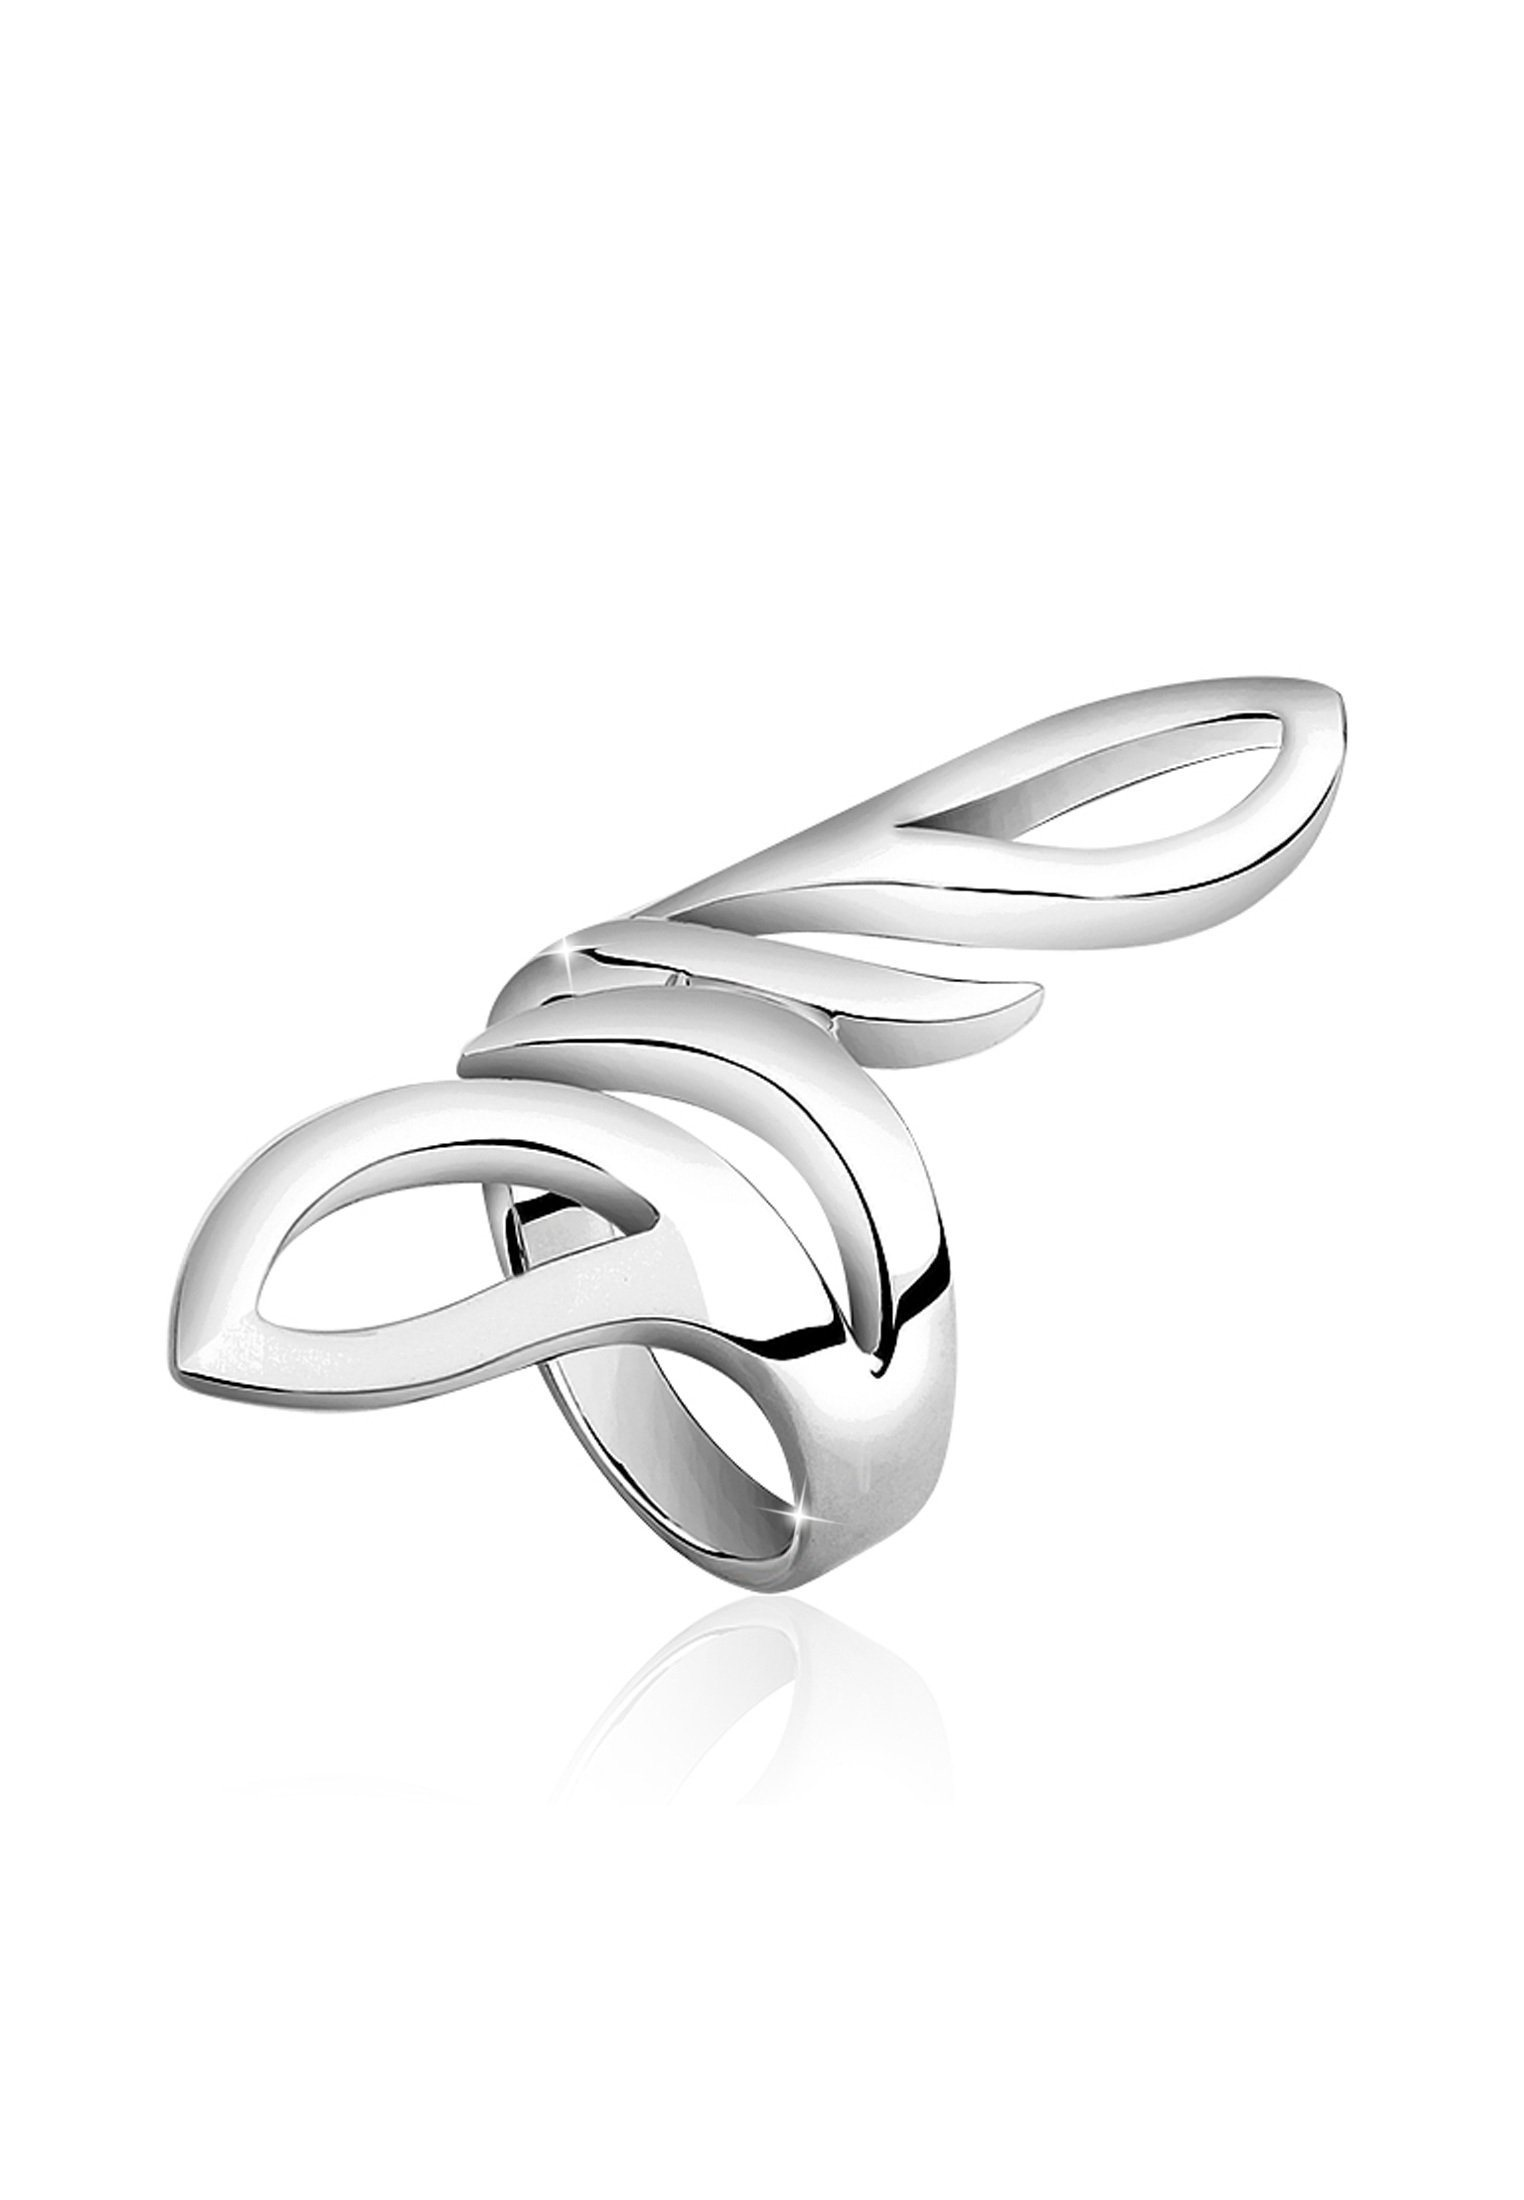 Nenalina Fingerring »Wickelring Basic Statement Struktur 925 Silber« | Schmuck > Ringe > Fingerringe | Silber | Nenalina